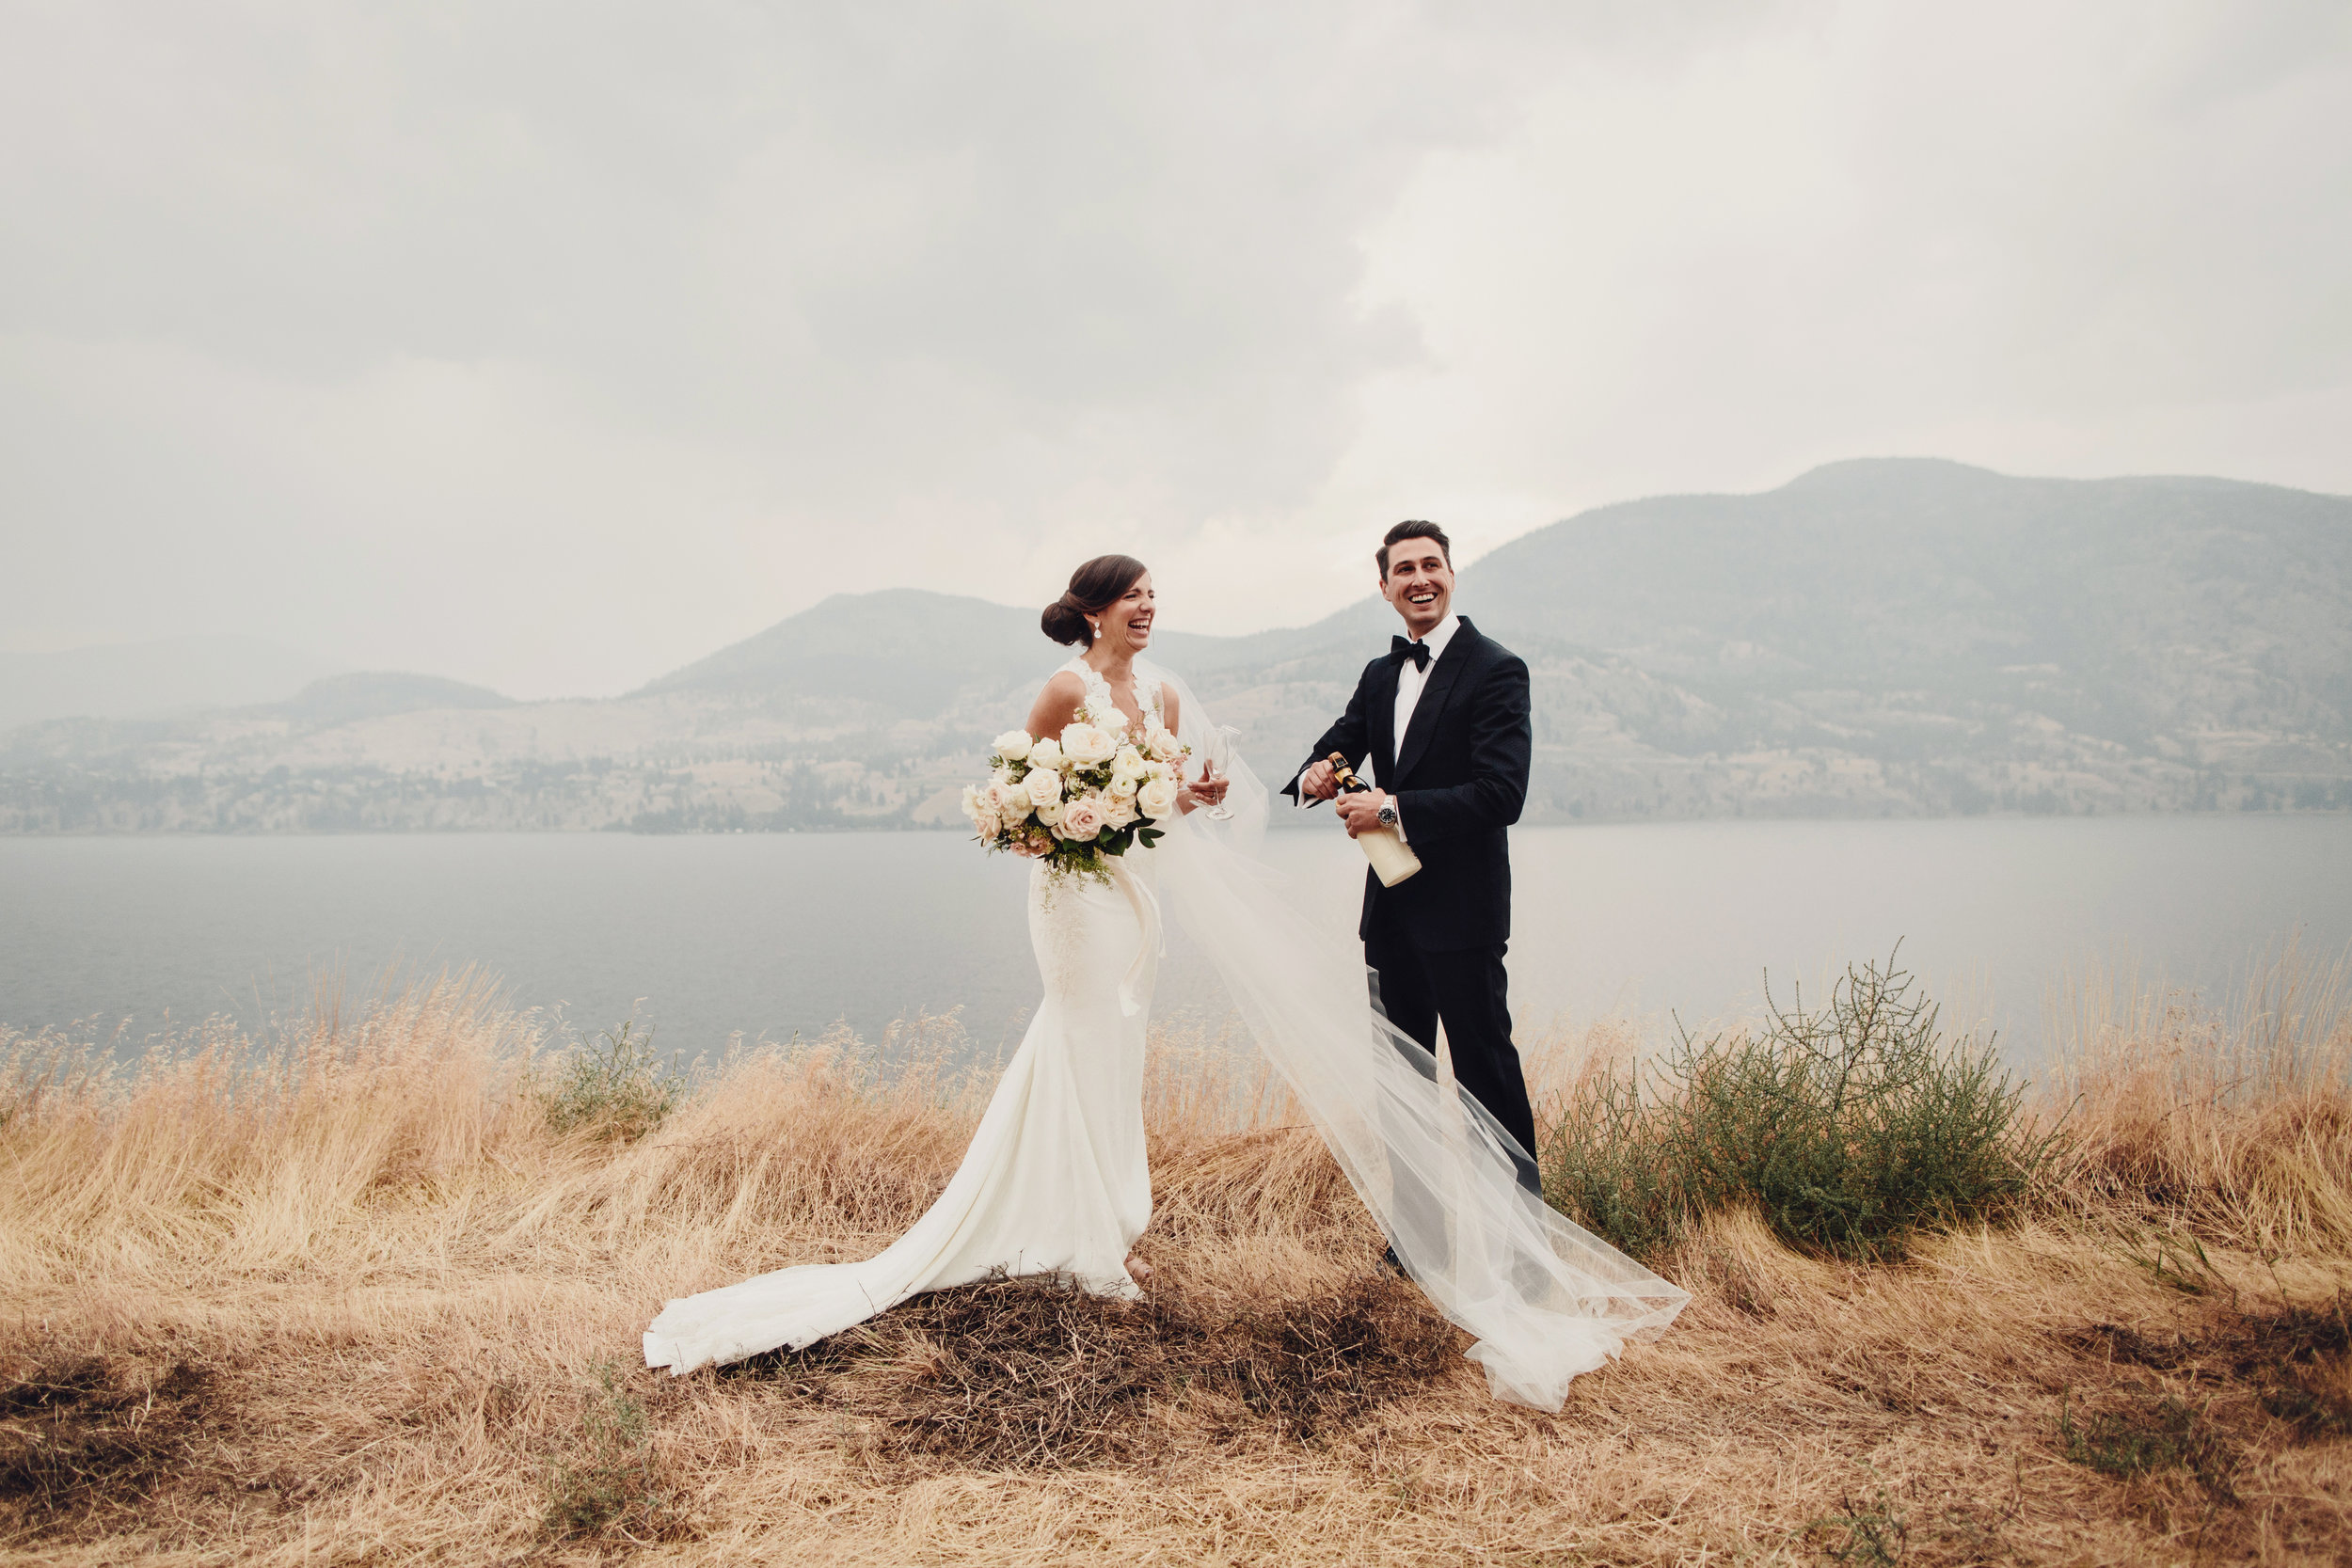 taylor-roades-wedding-0663.JPG